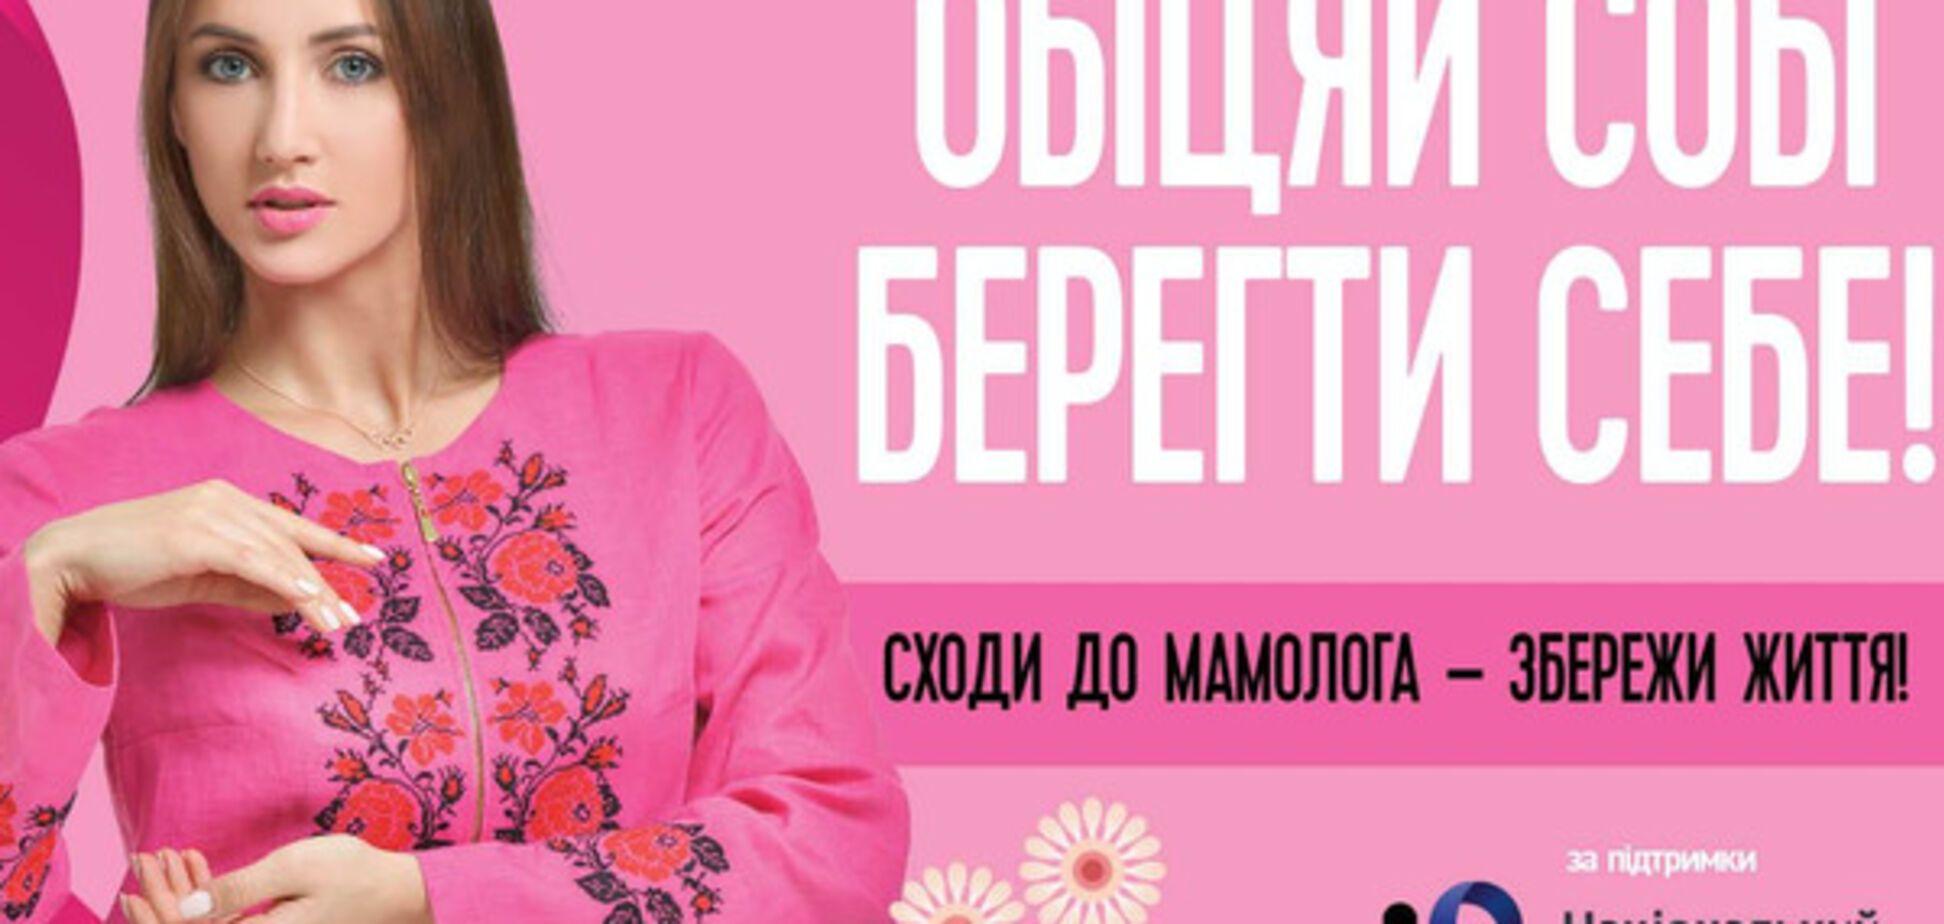 Призер Олимпиады – против рака груди